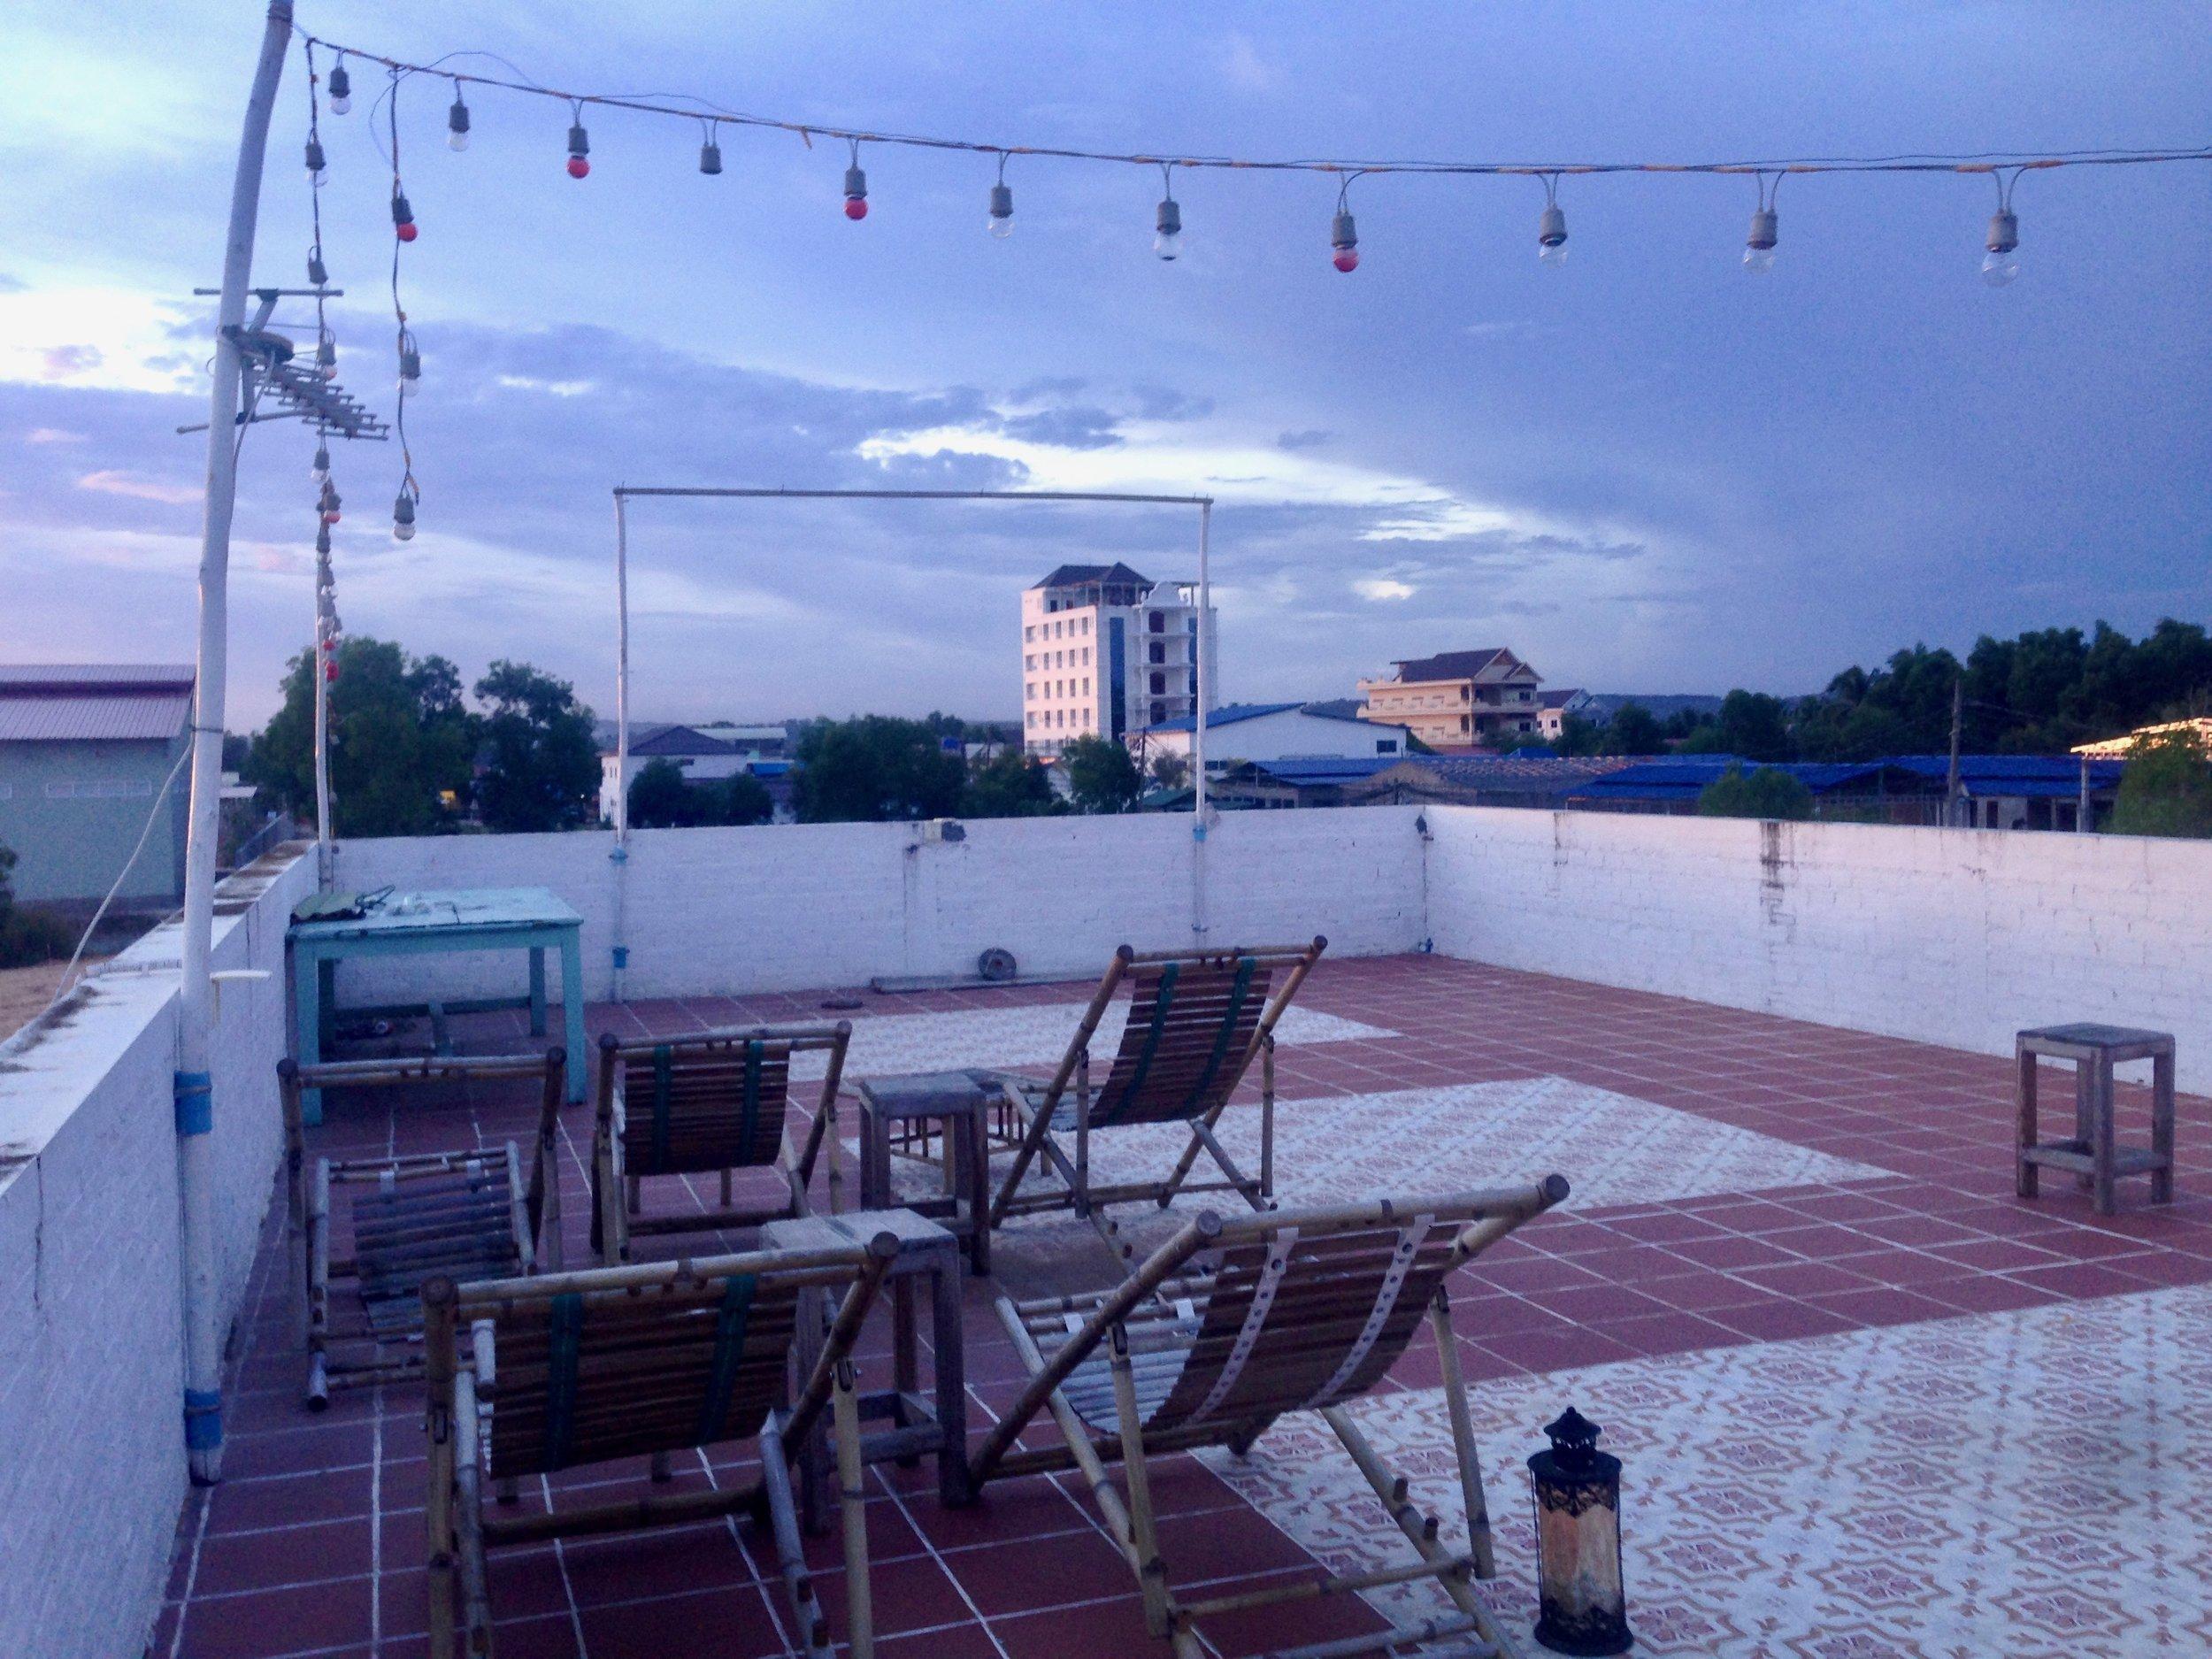 Sunset rooftop vibes before the movie marathon starts